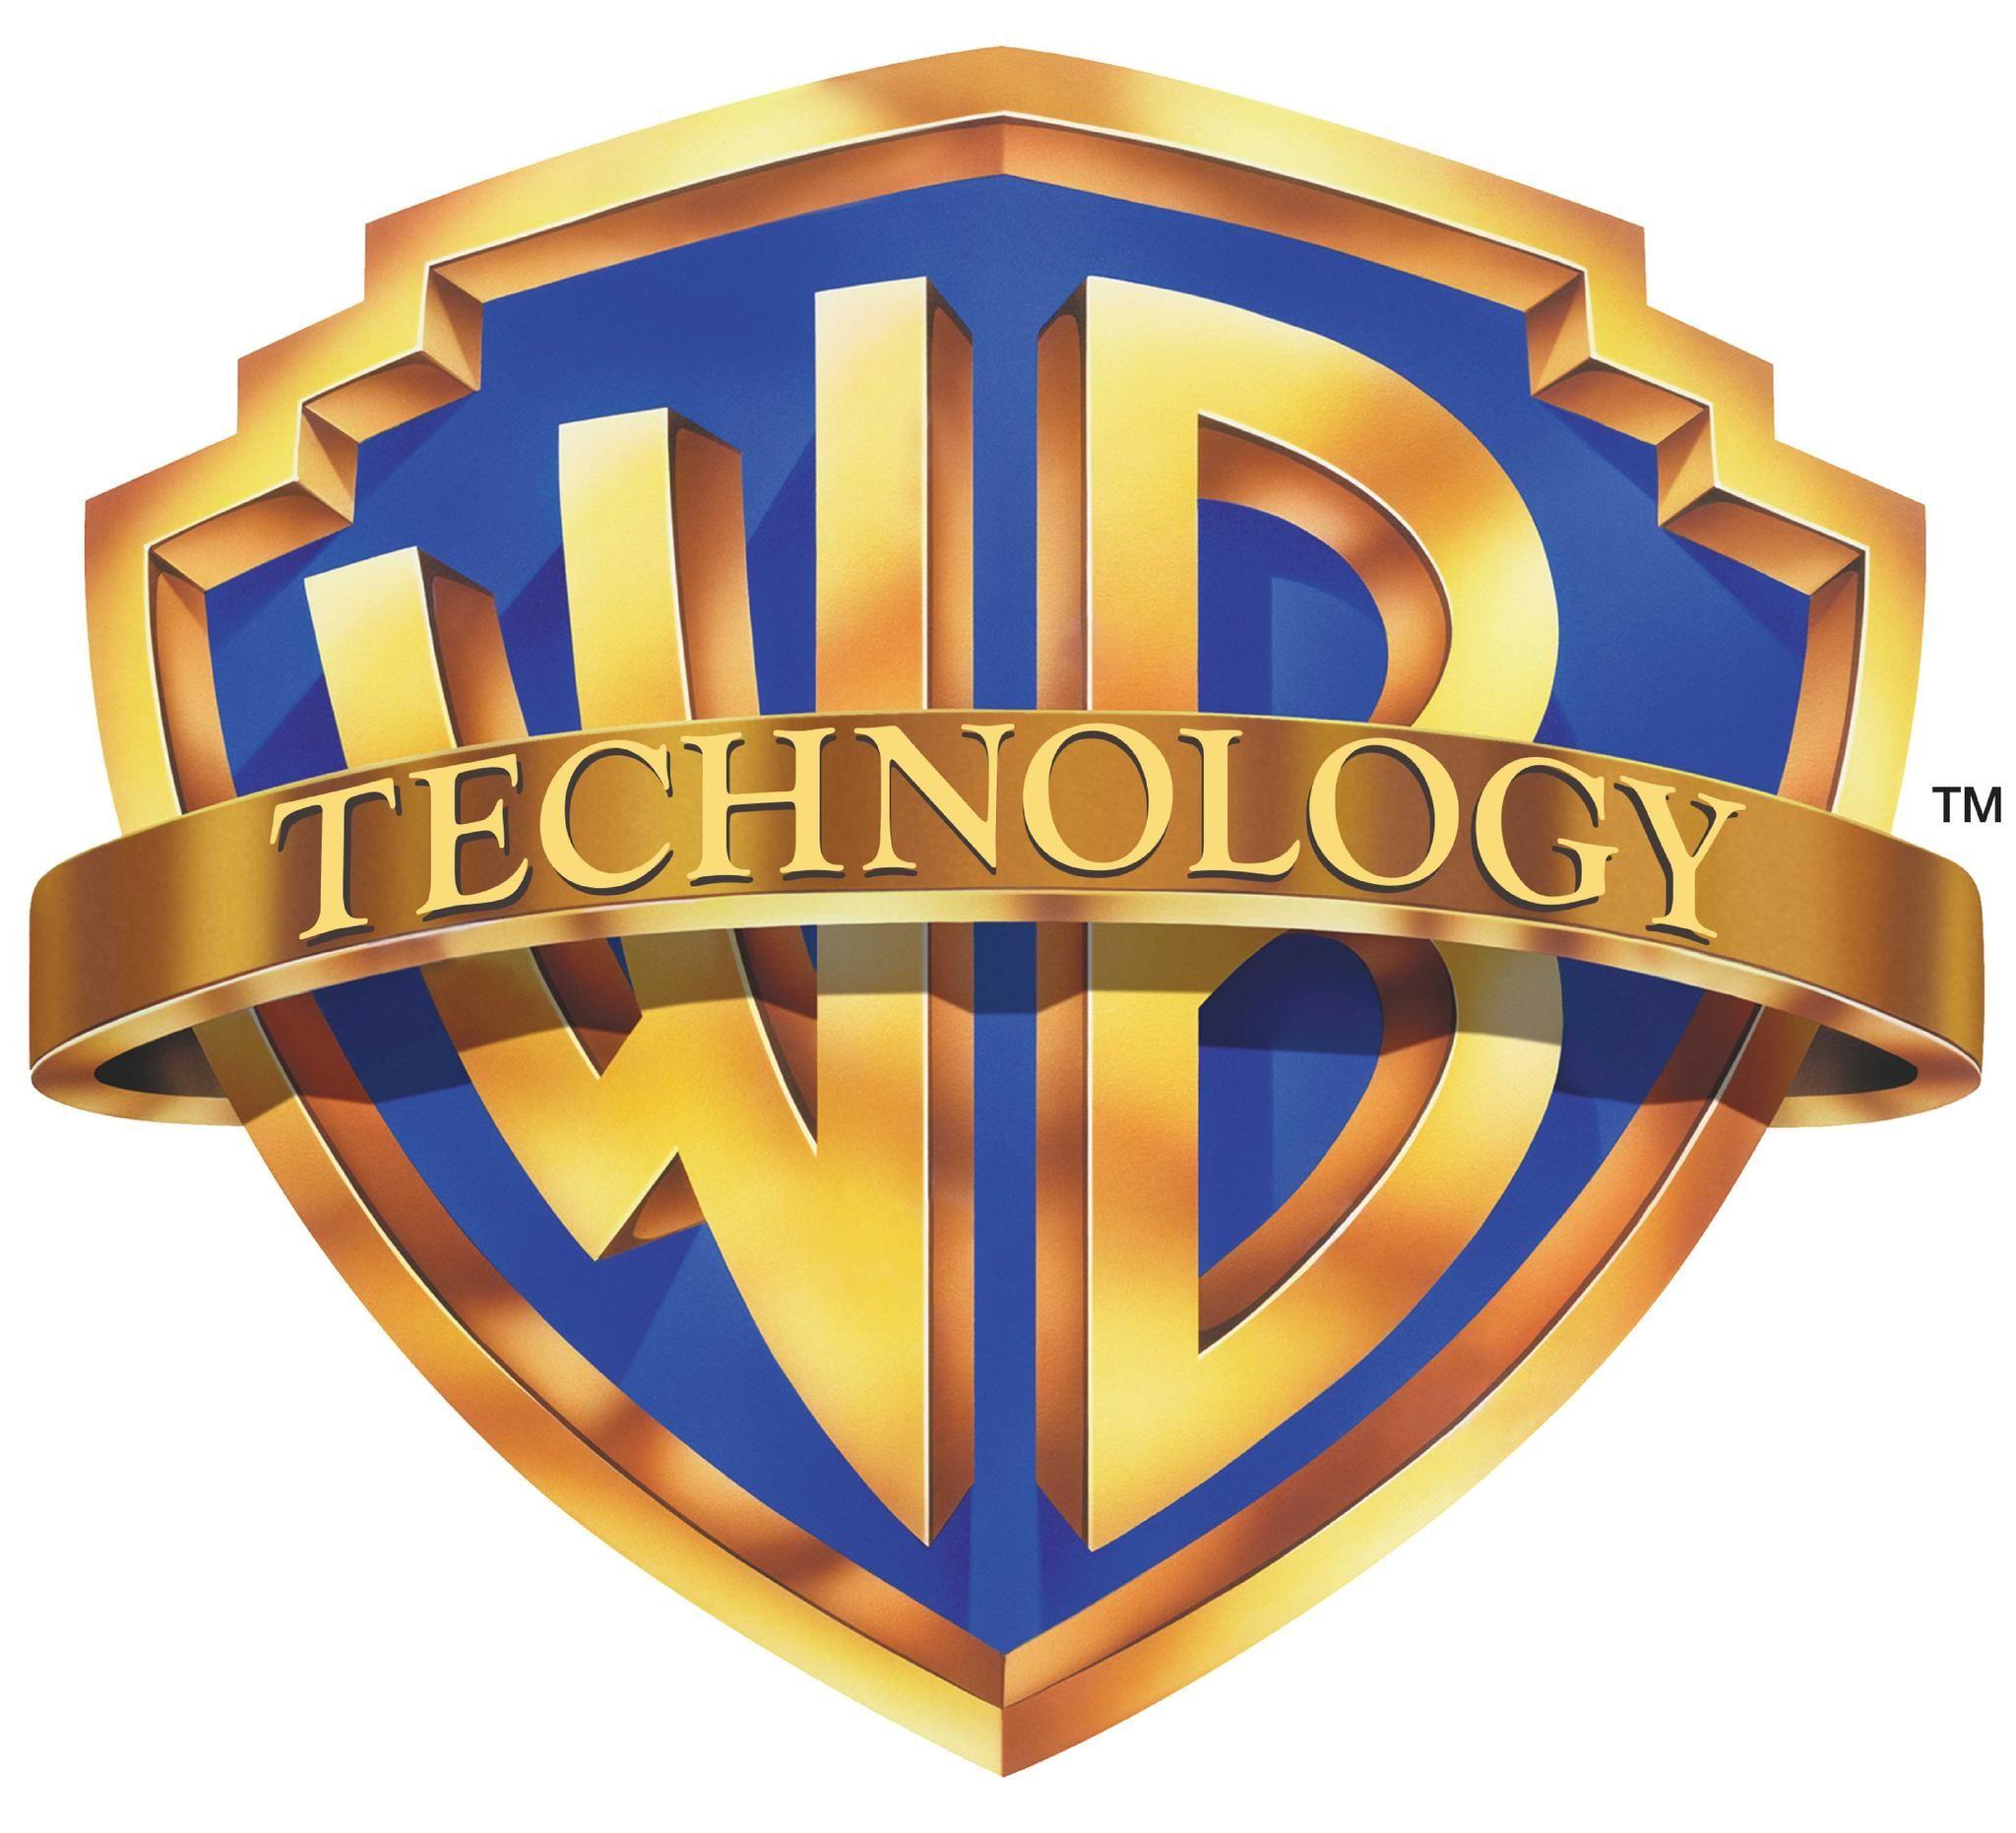 WB-Technology-TM-1.jpg